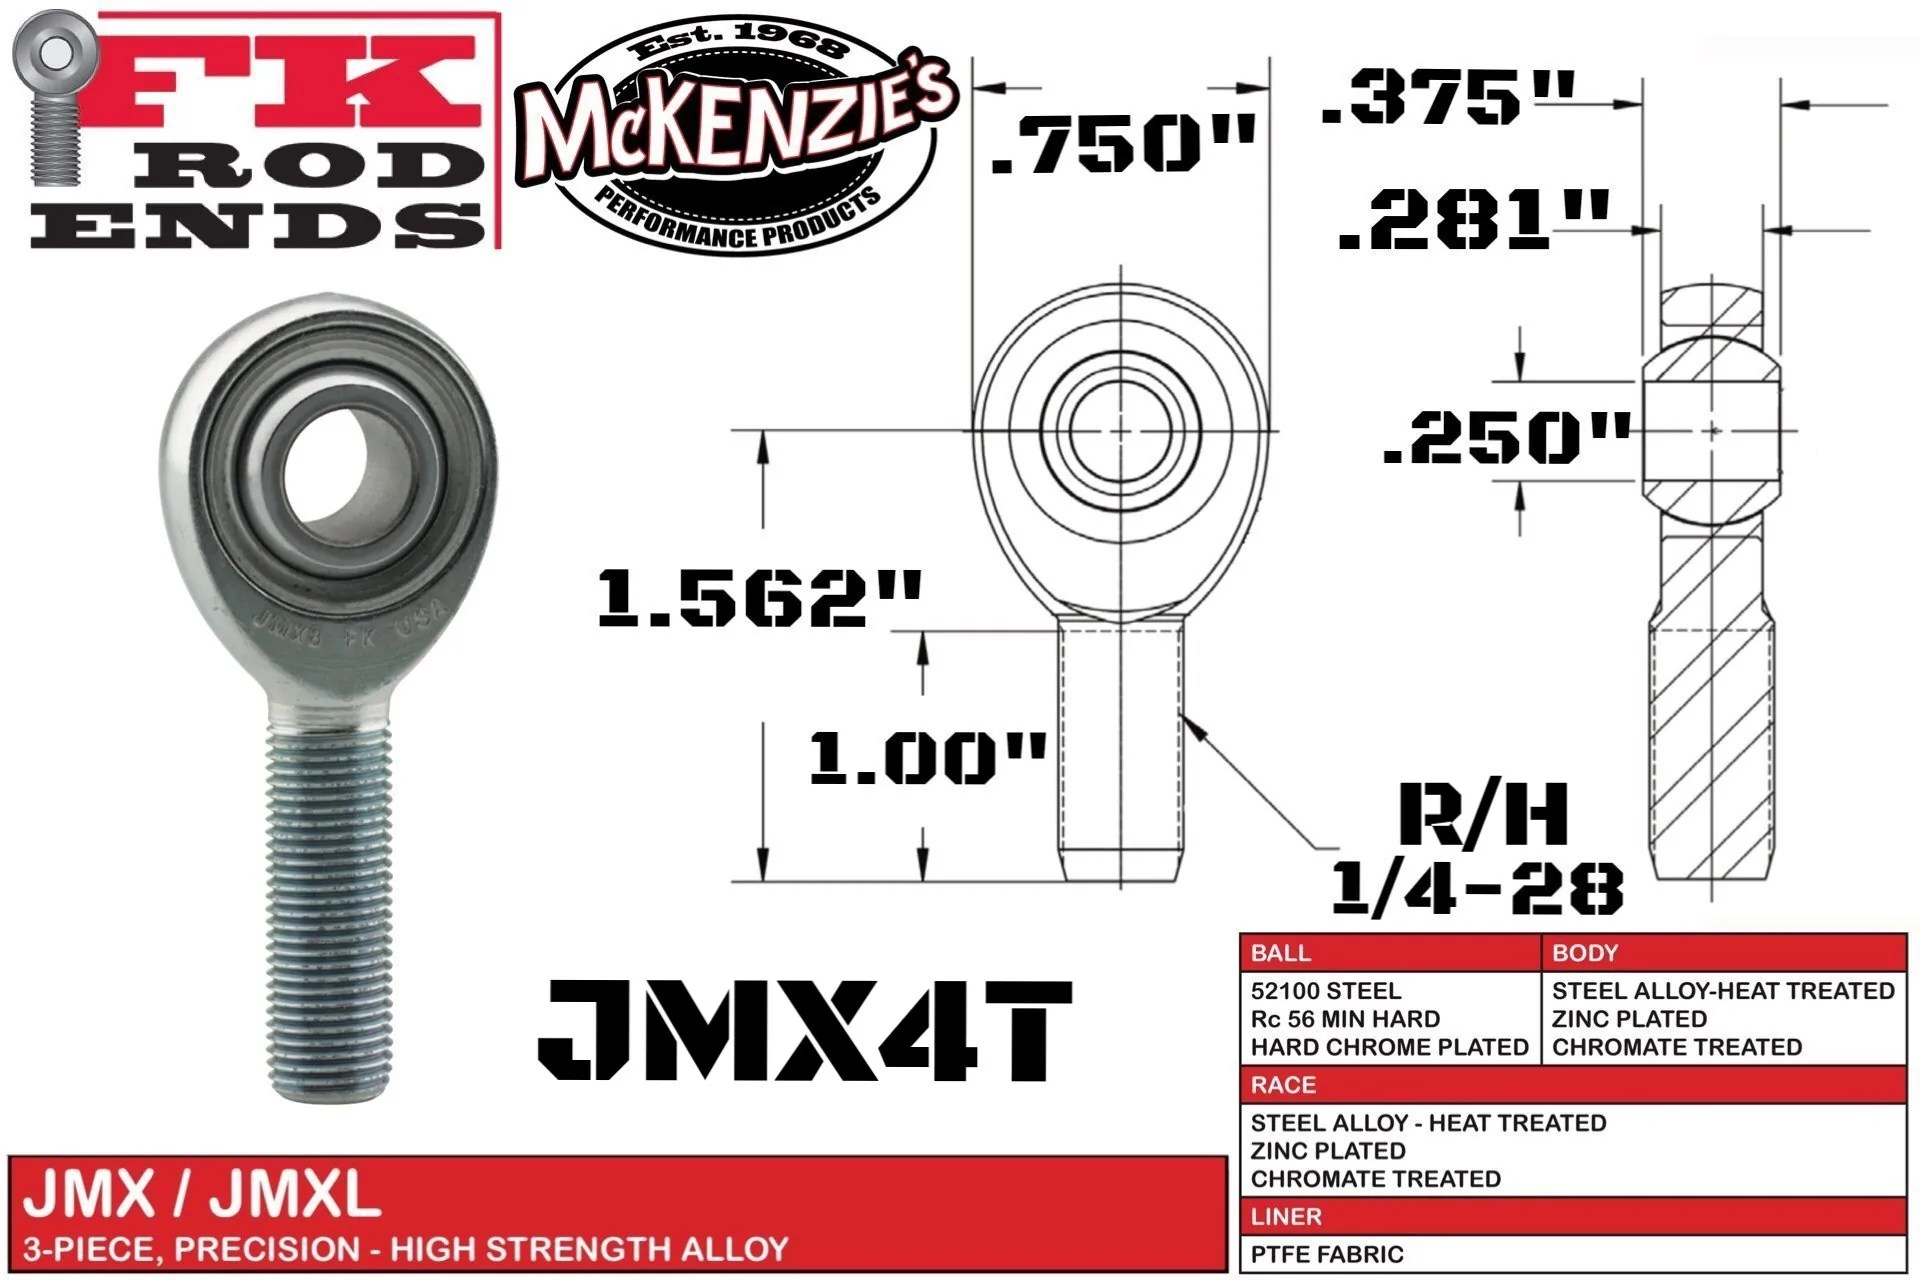 jmx4t male r h heim 1 4 28 thread 250 ball fk bearing [ 1920 x 1280 Pixel ]